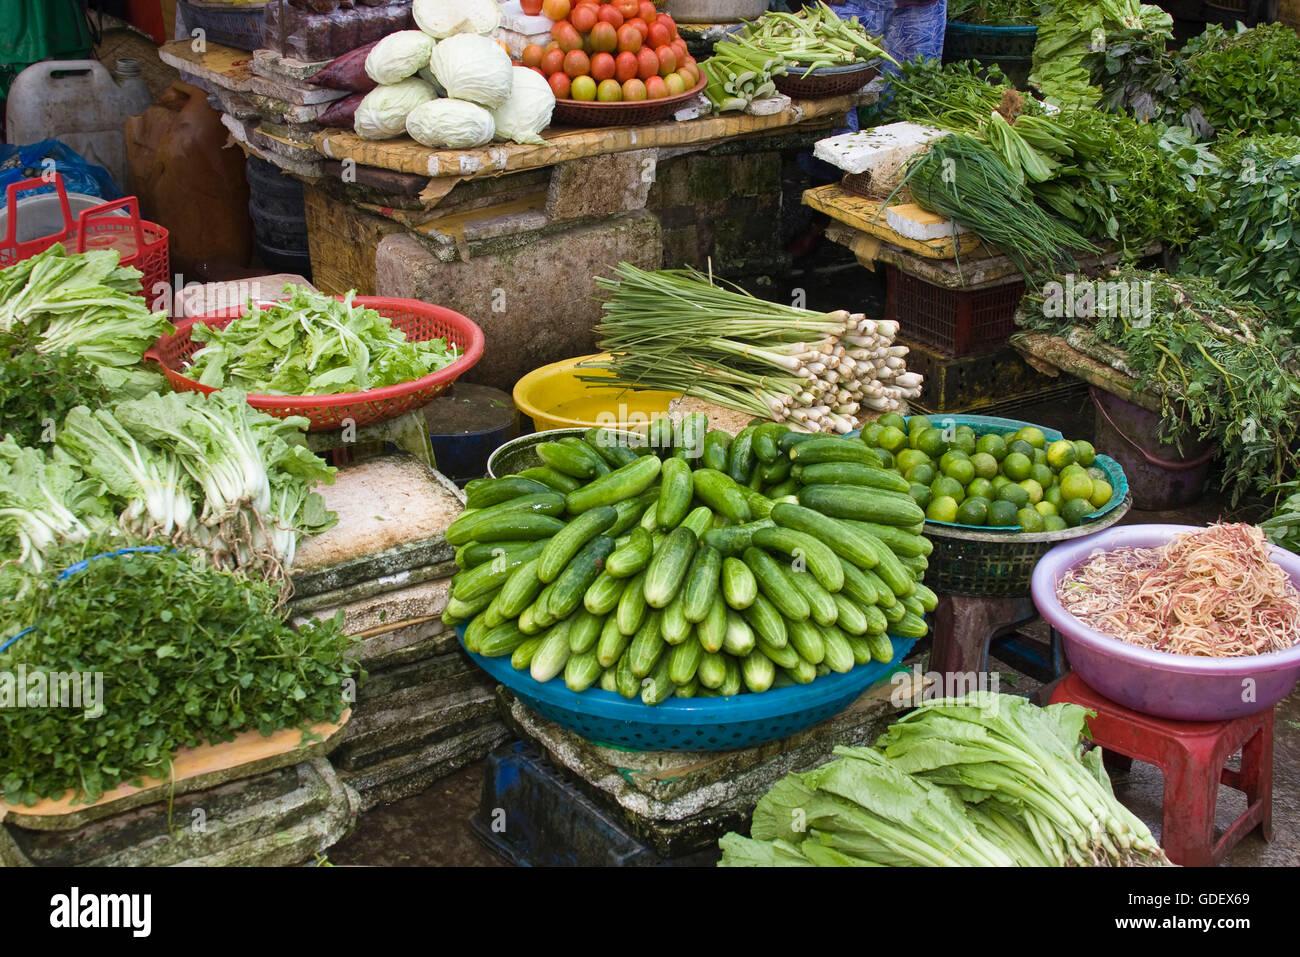 Market, vegetable stall, vegetable sale, Phu Quoc, Vietnam - Stock Image